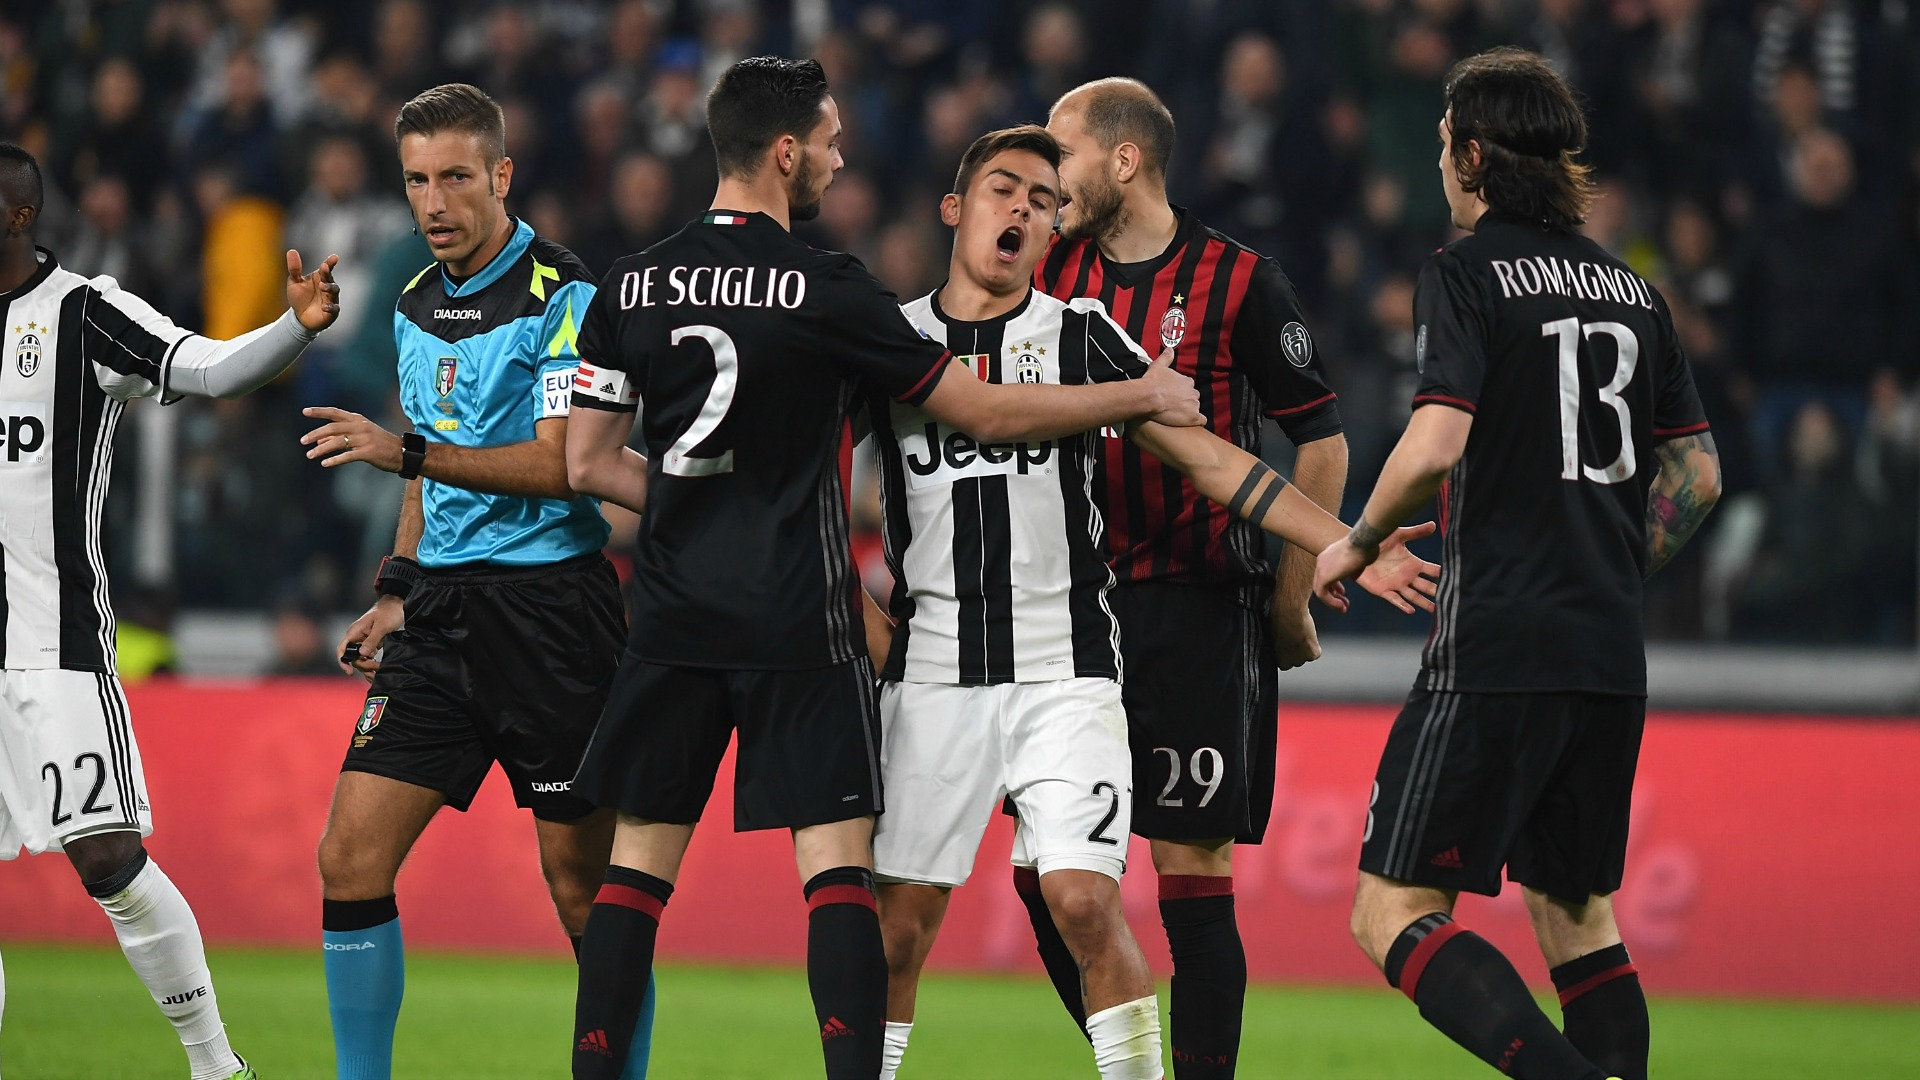 Mattia De Sciglio Paulo Dybala Alessio Romagnoli Juventus Milan Serie A